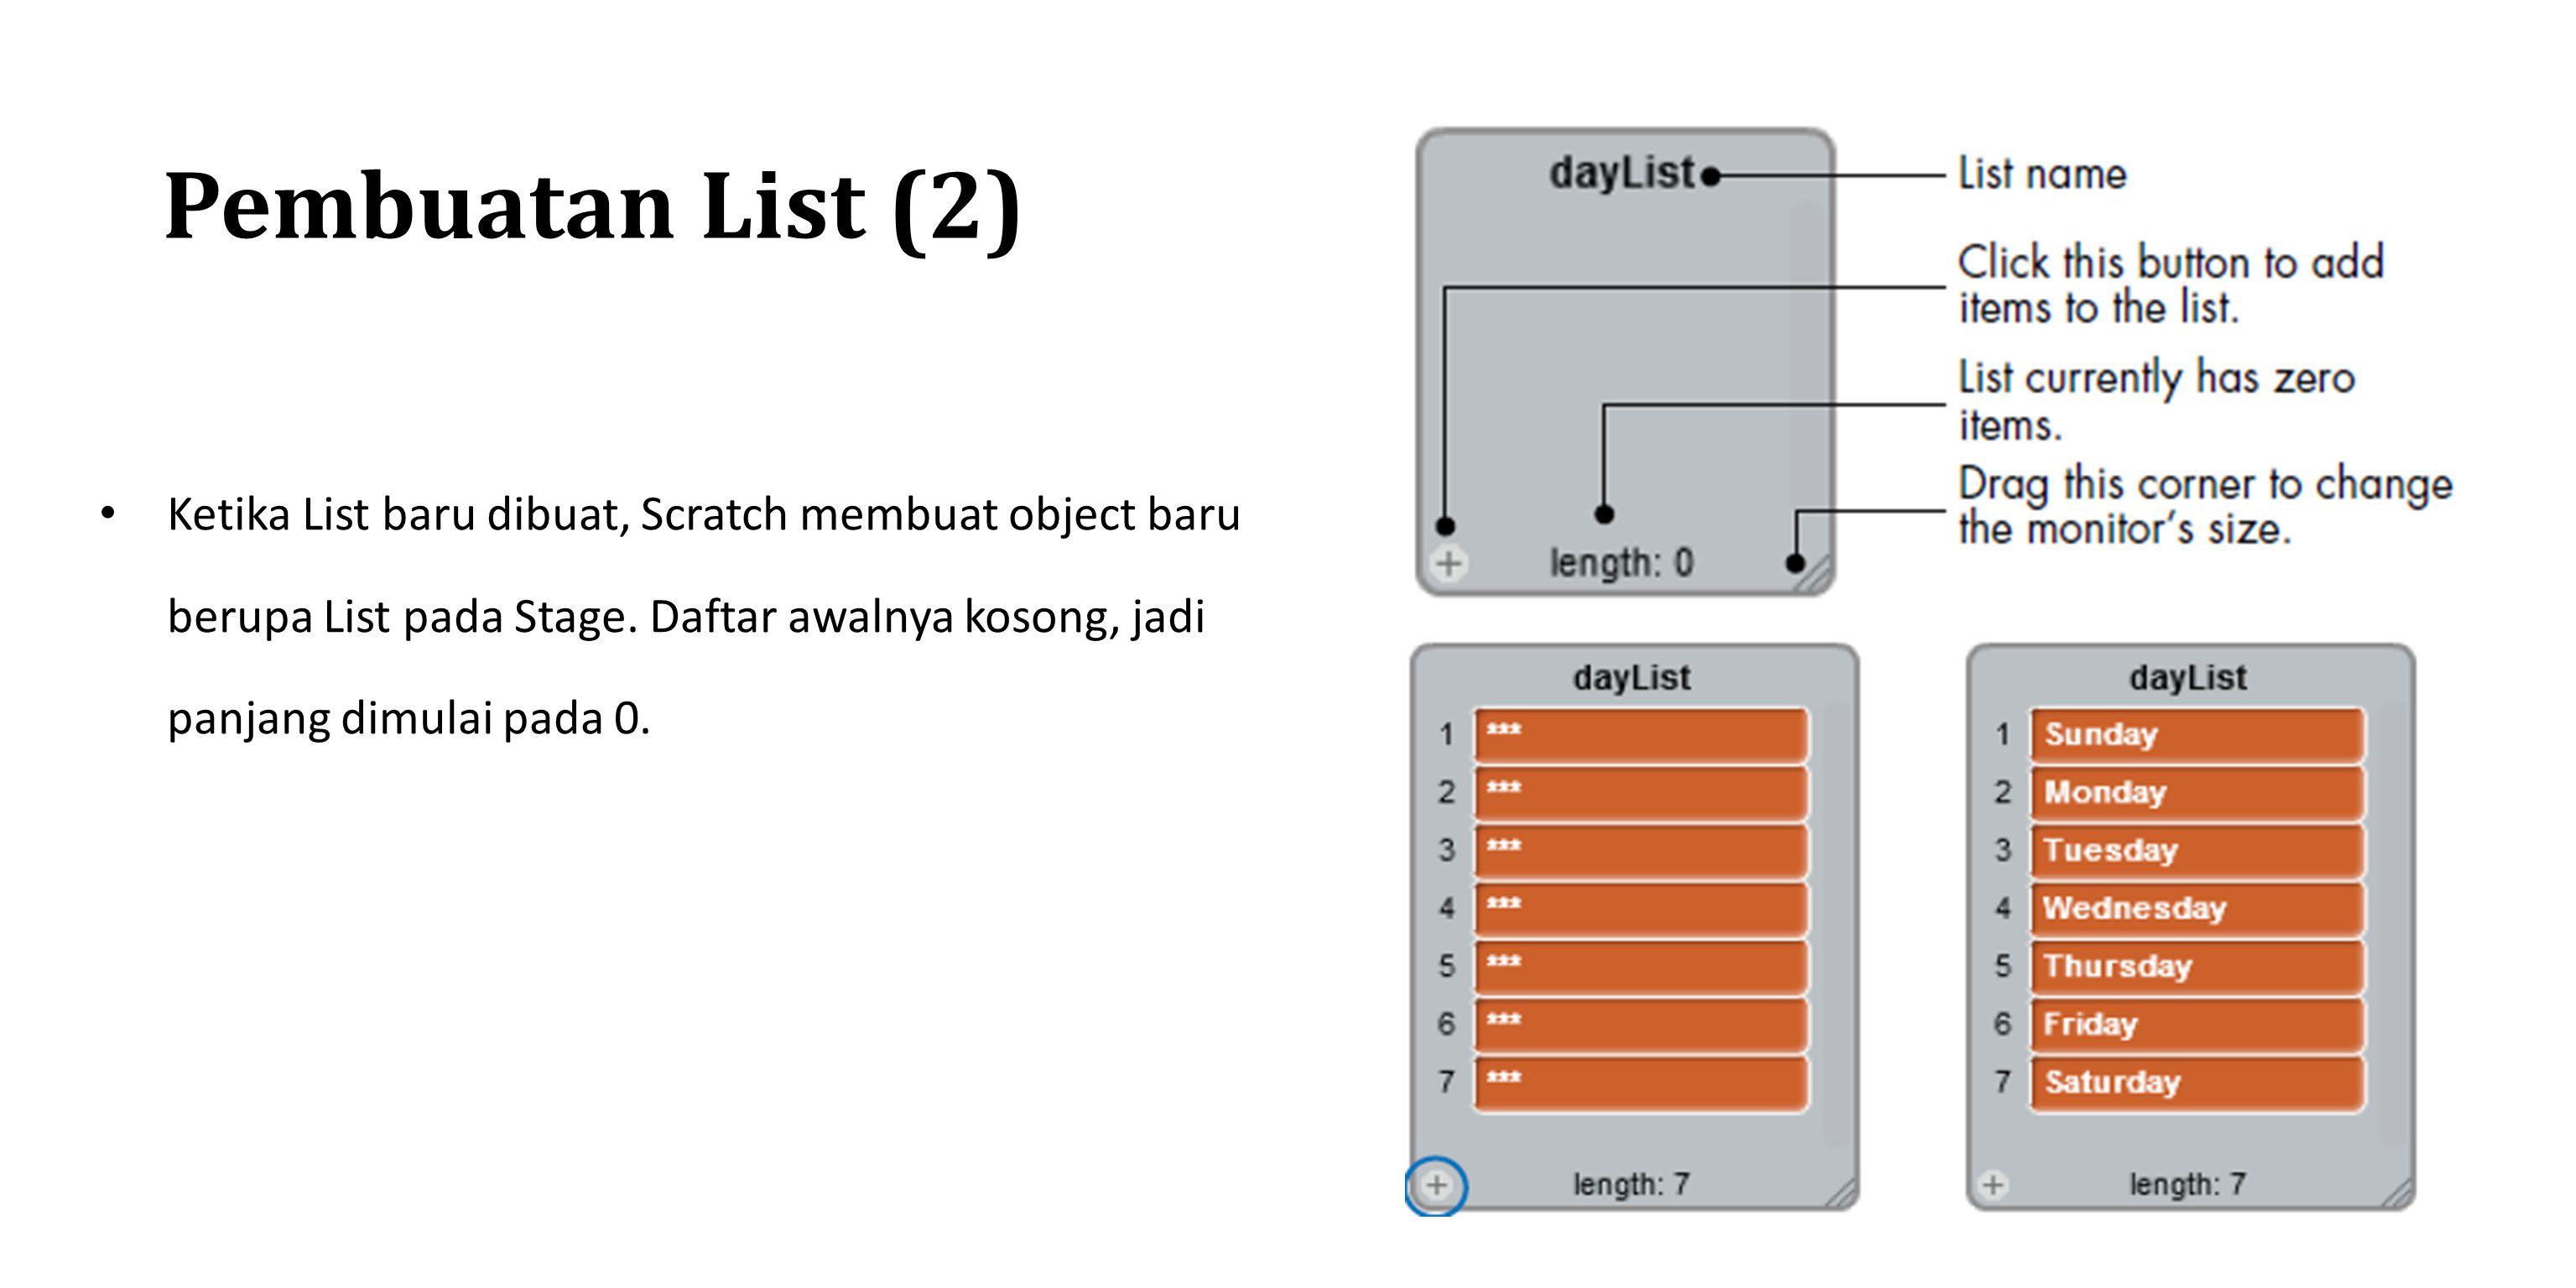 Pembuatan List (2) Ketika List baru dibuat, Scratch membuat object baru berupa List pada Stage.